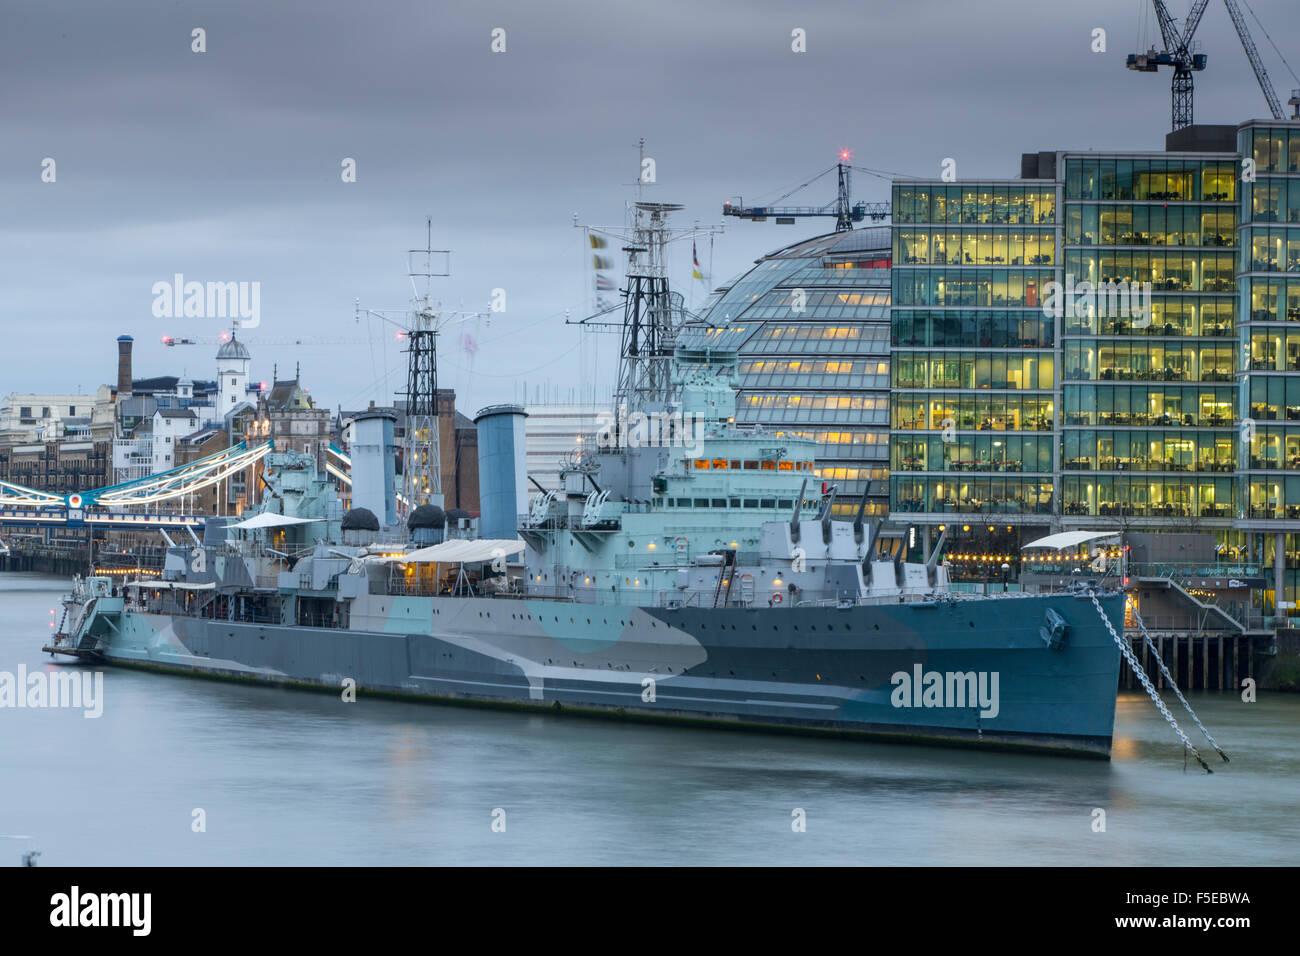 HMS Belfast and City Hall, London, England, United Kingdom, Europe - Stock Image